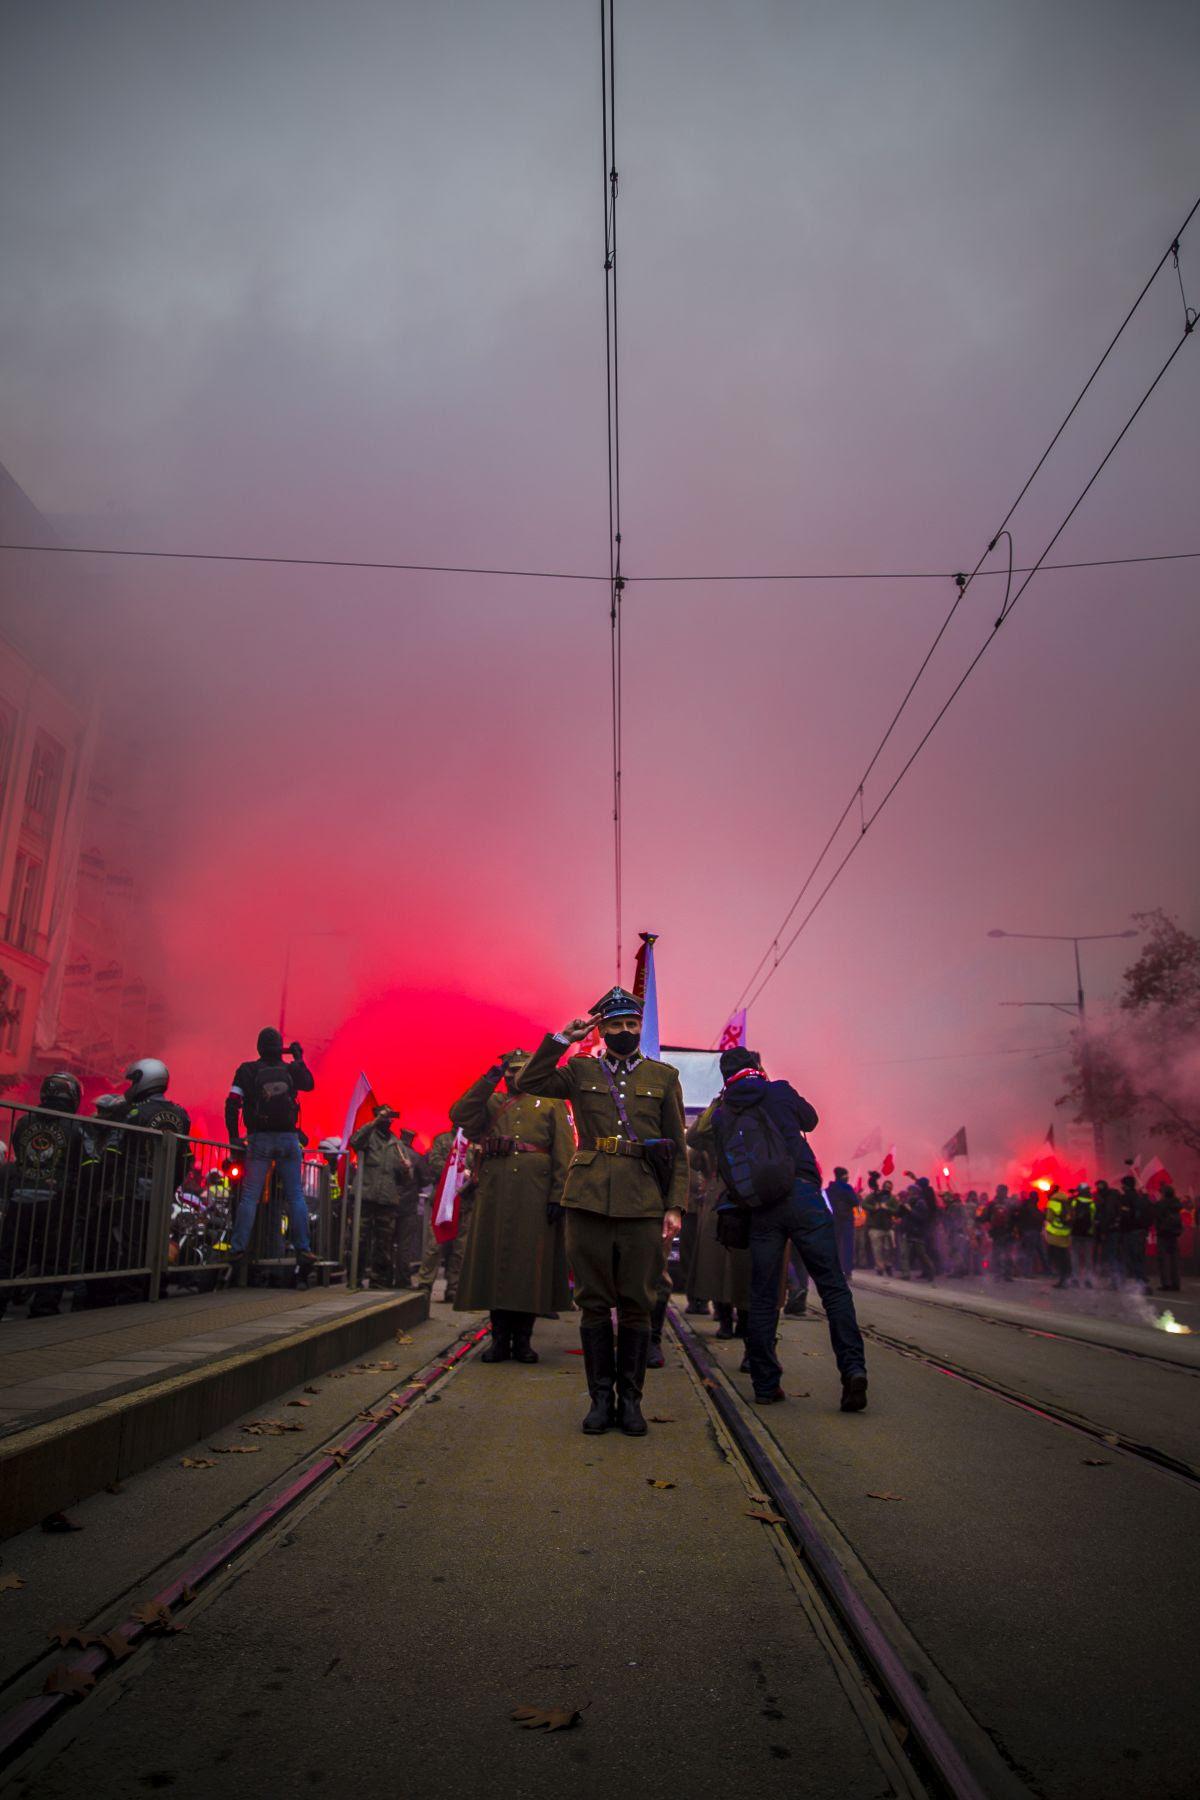 Marsz Niepodległości 2020: https://marszniepodleglosci.pl/wp-content/uploads/2020/11/20201111-Marsz-Niepodleglosci-fot.-K.-Olszewska-020.jpg